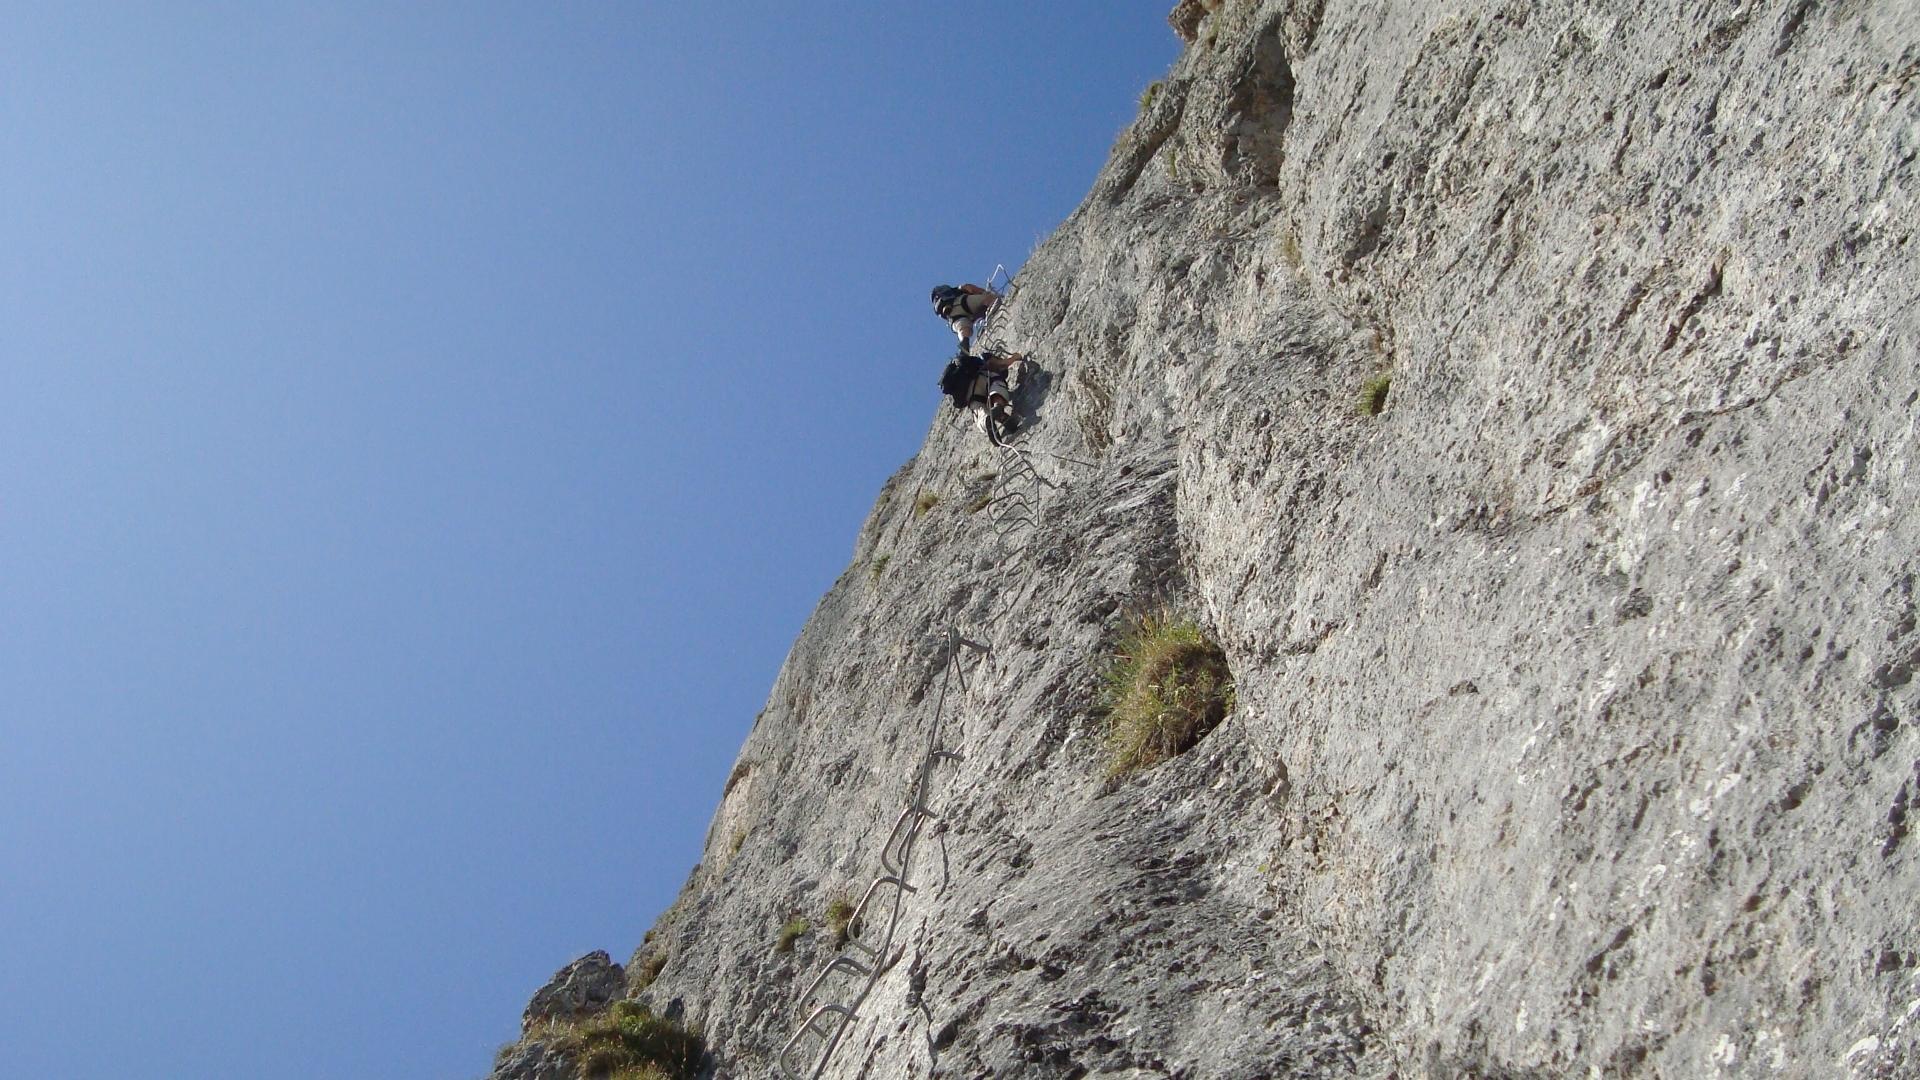 Klettersteig Ostegghütte : Klettersteig